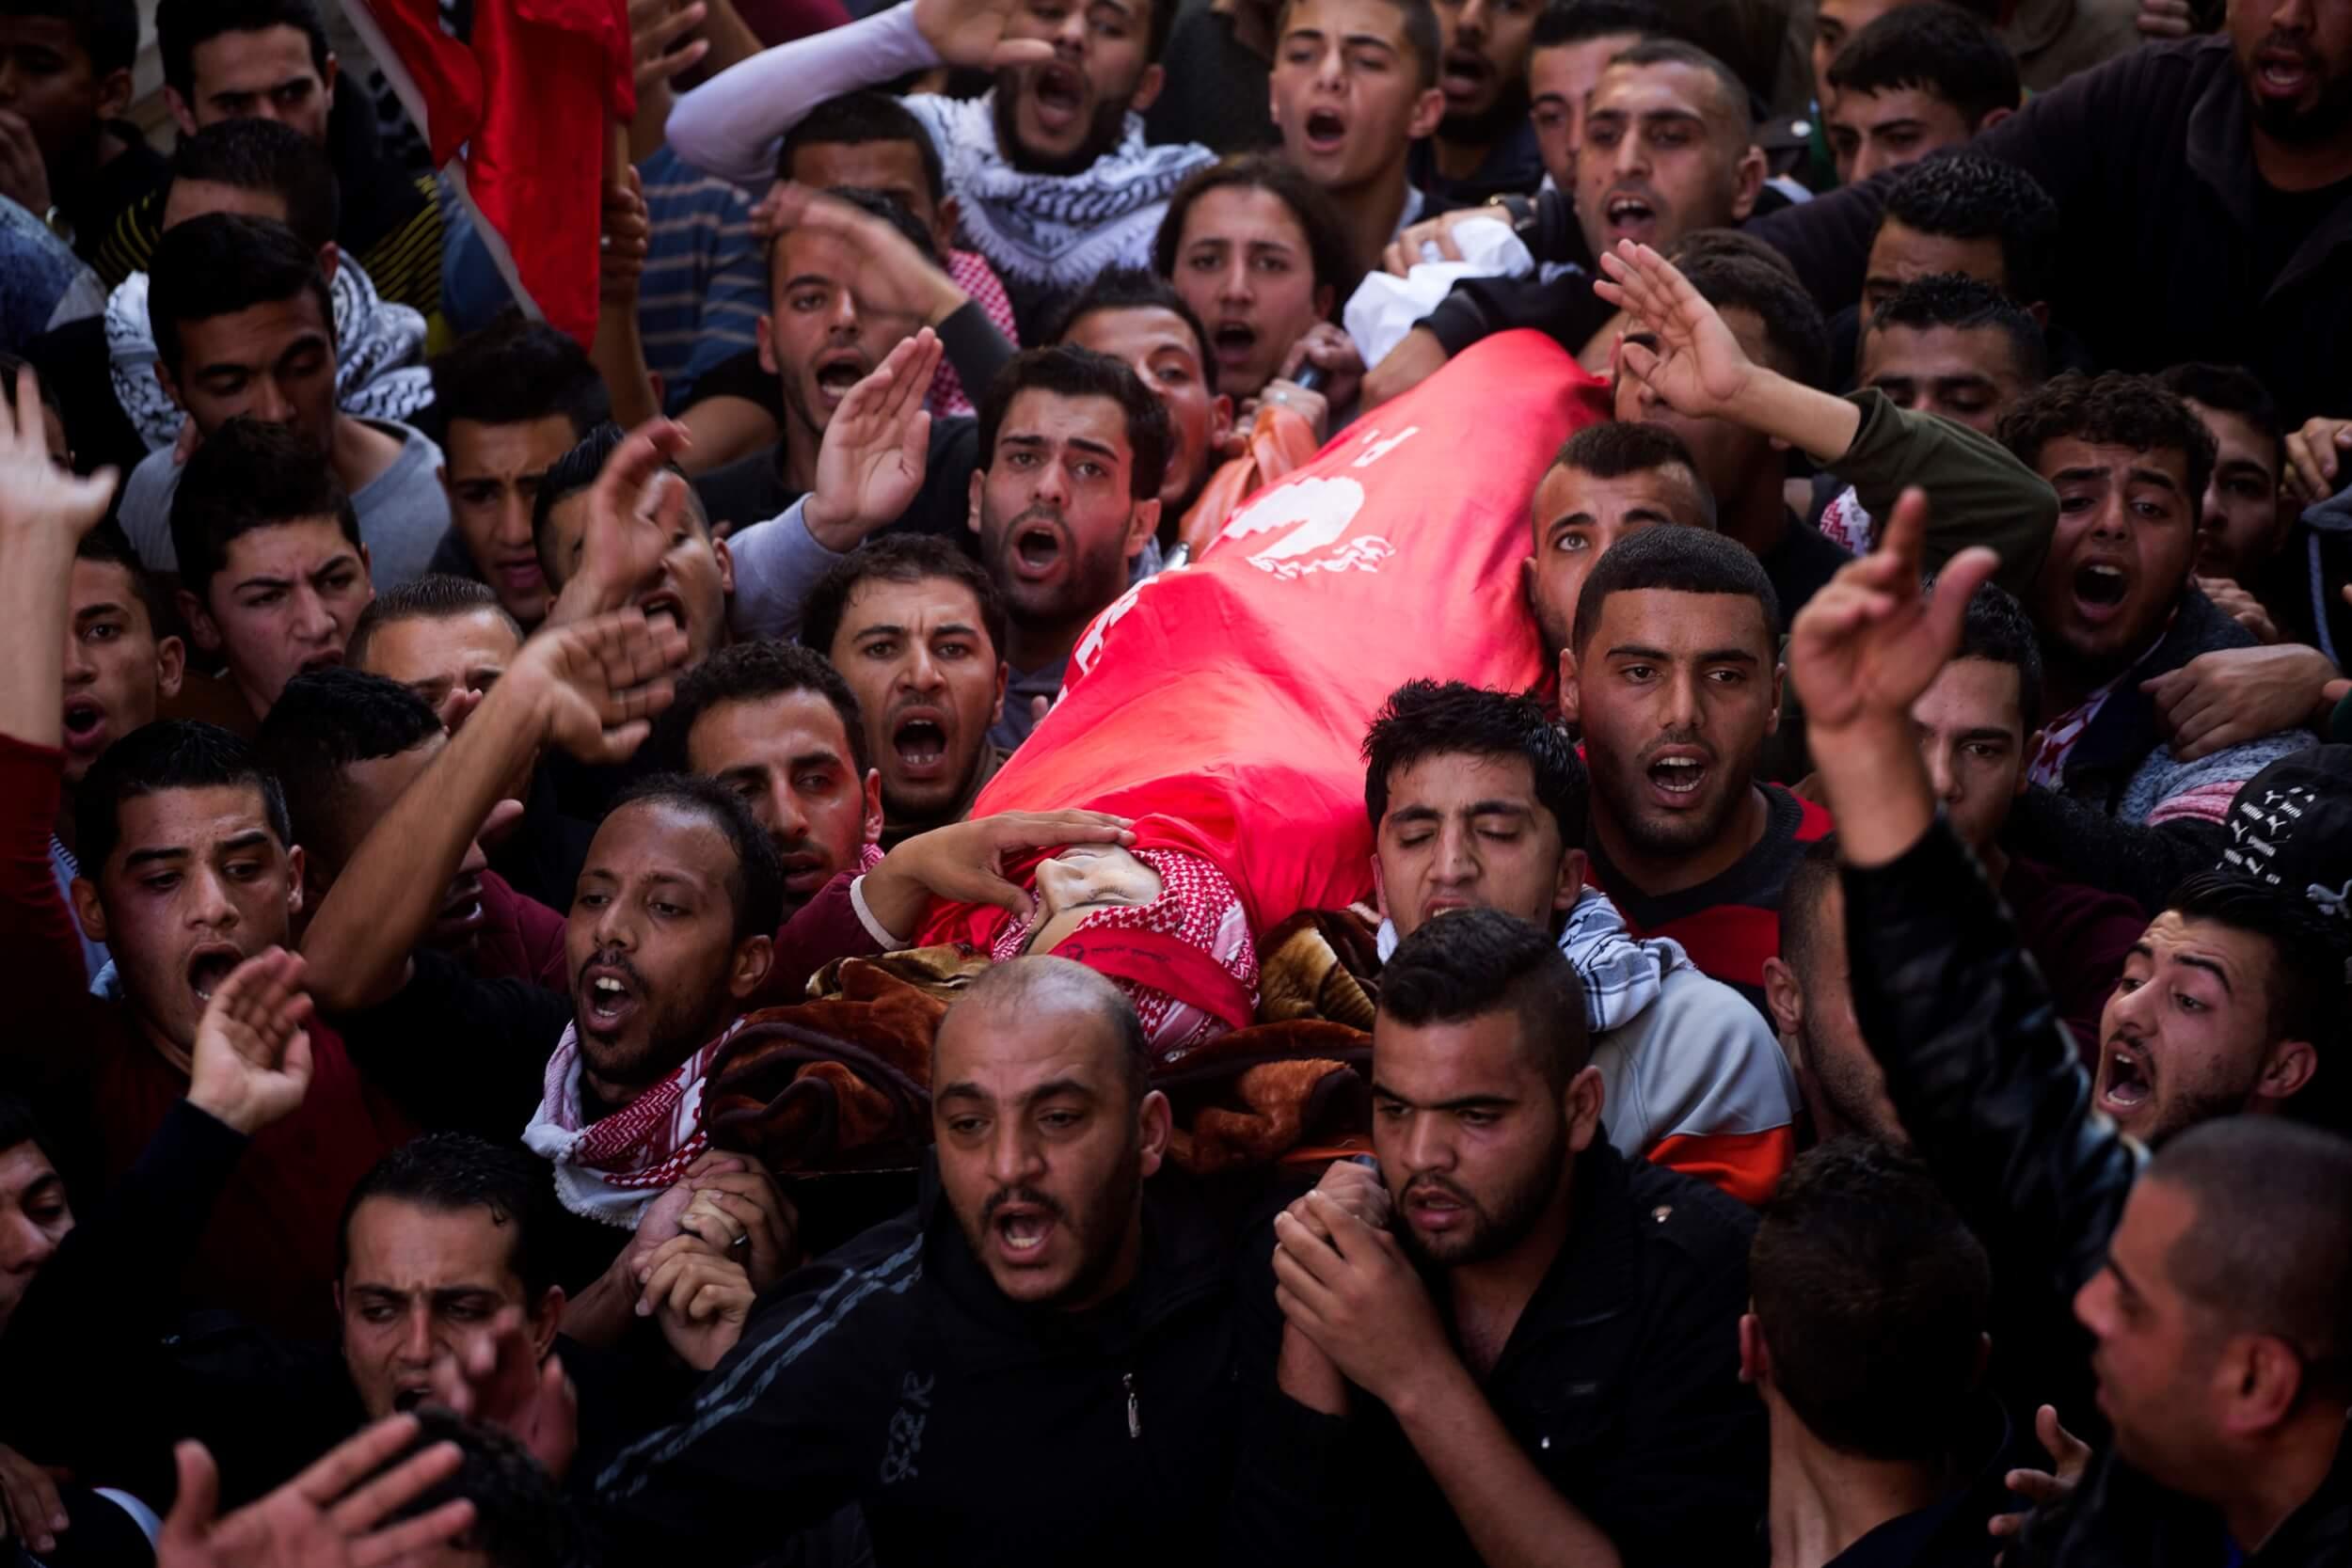 Funeral of Khalid Mahmoud al-Jawabreh